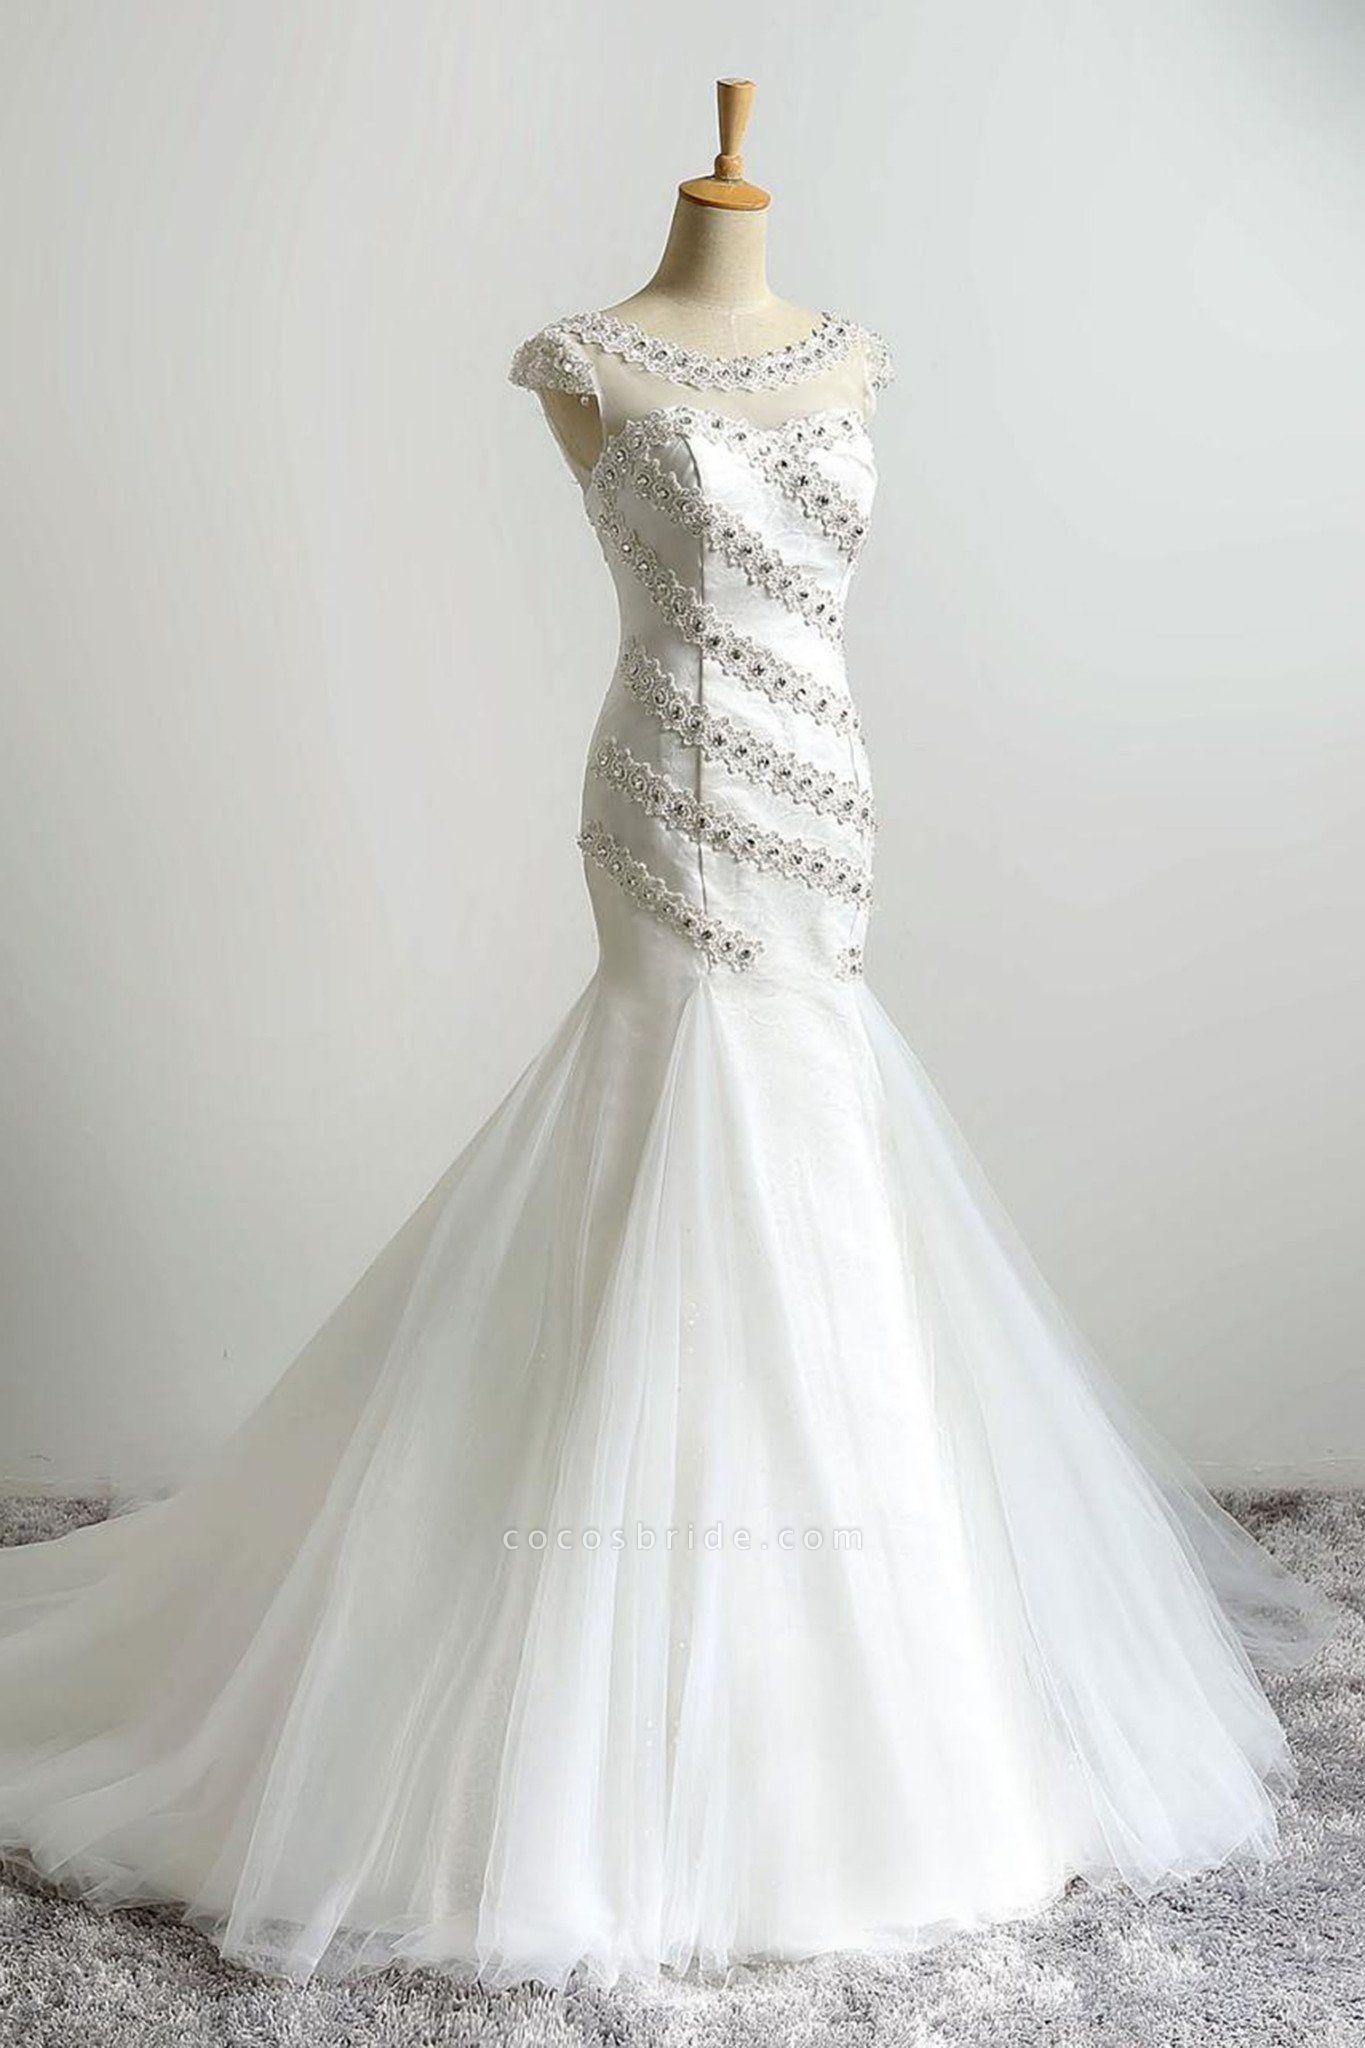 White Organza Beading Mermaid Train Wedding Dresses